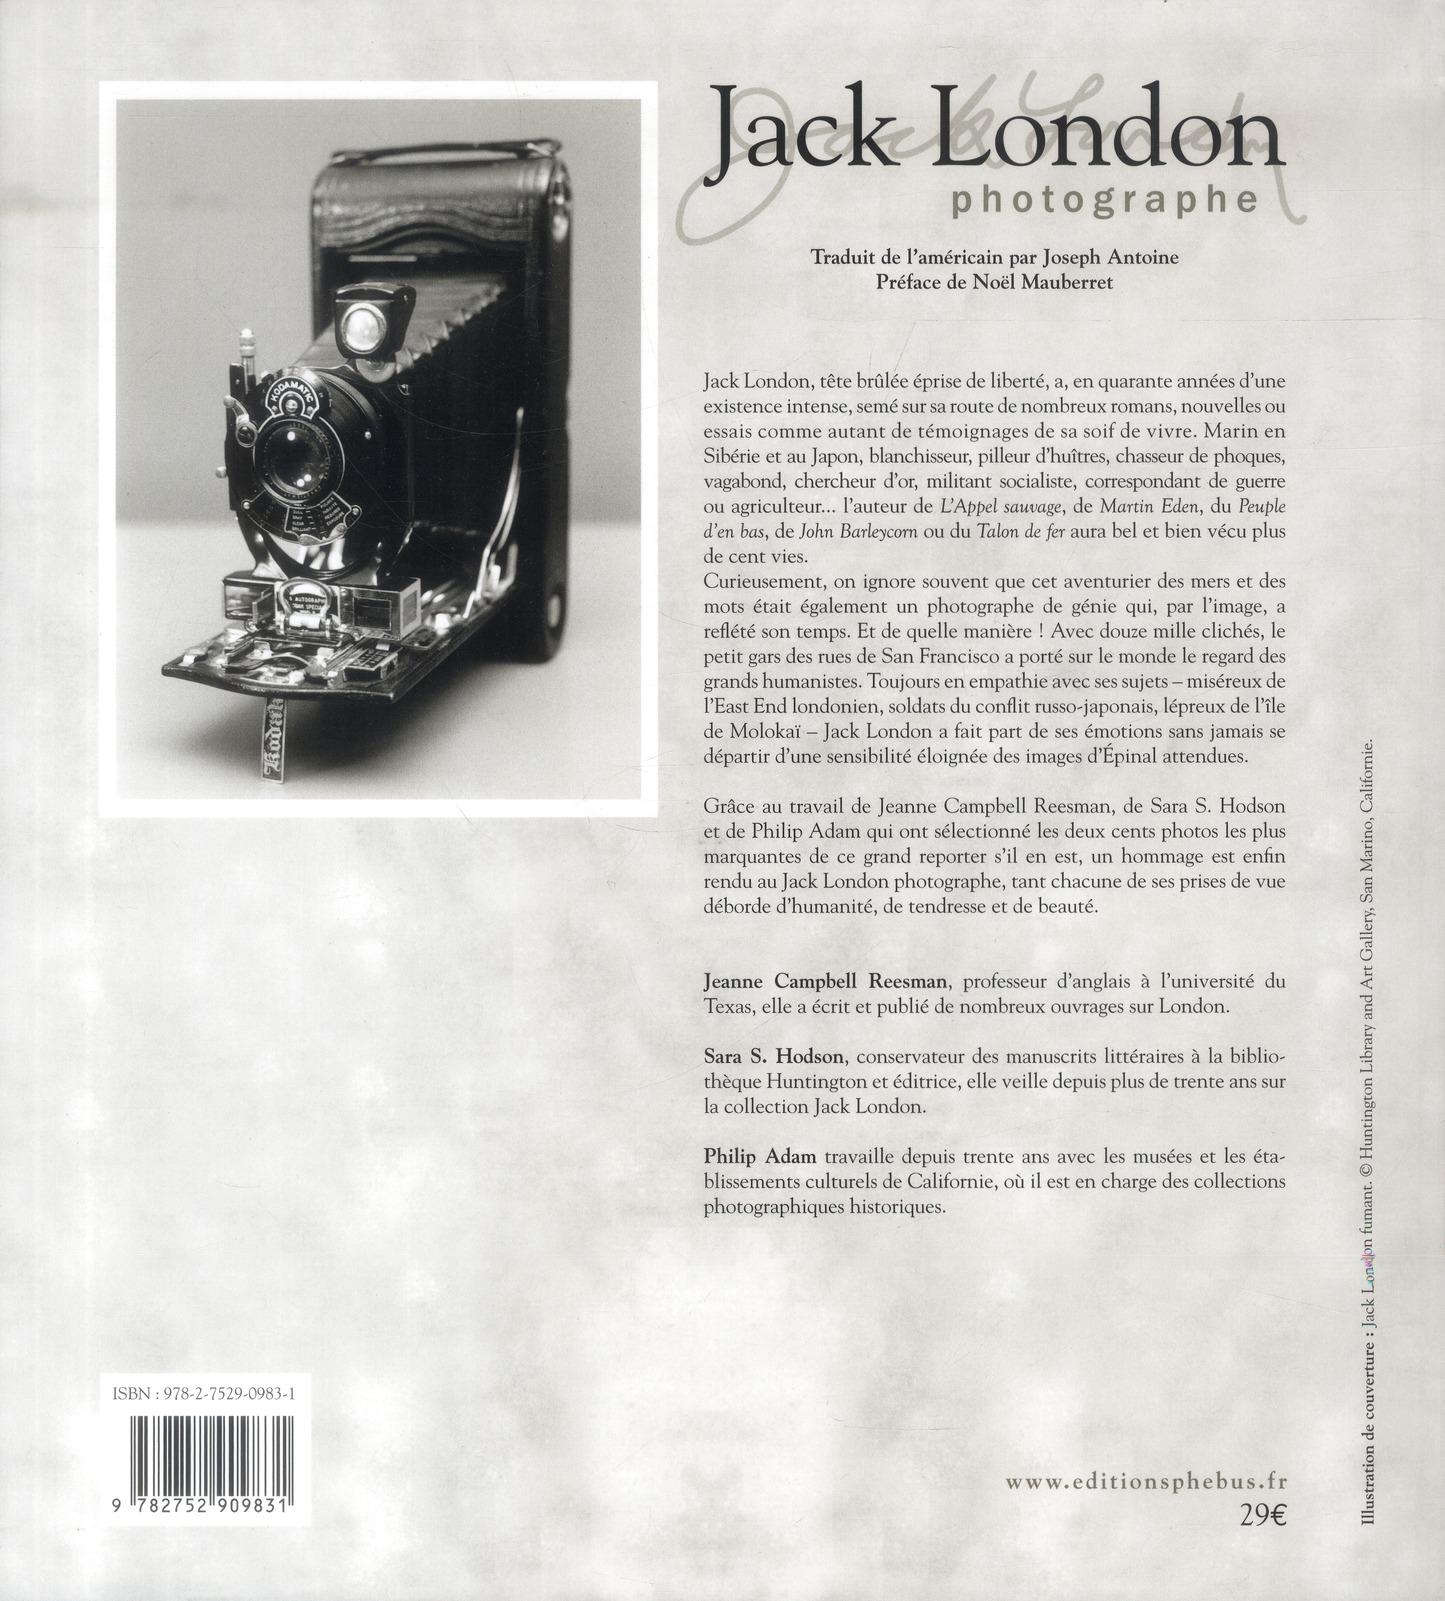 Jack London, photographe